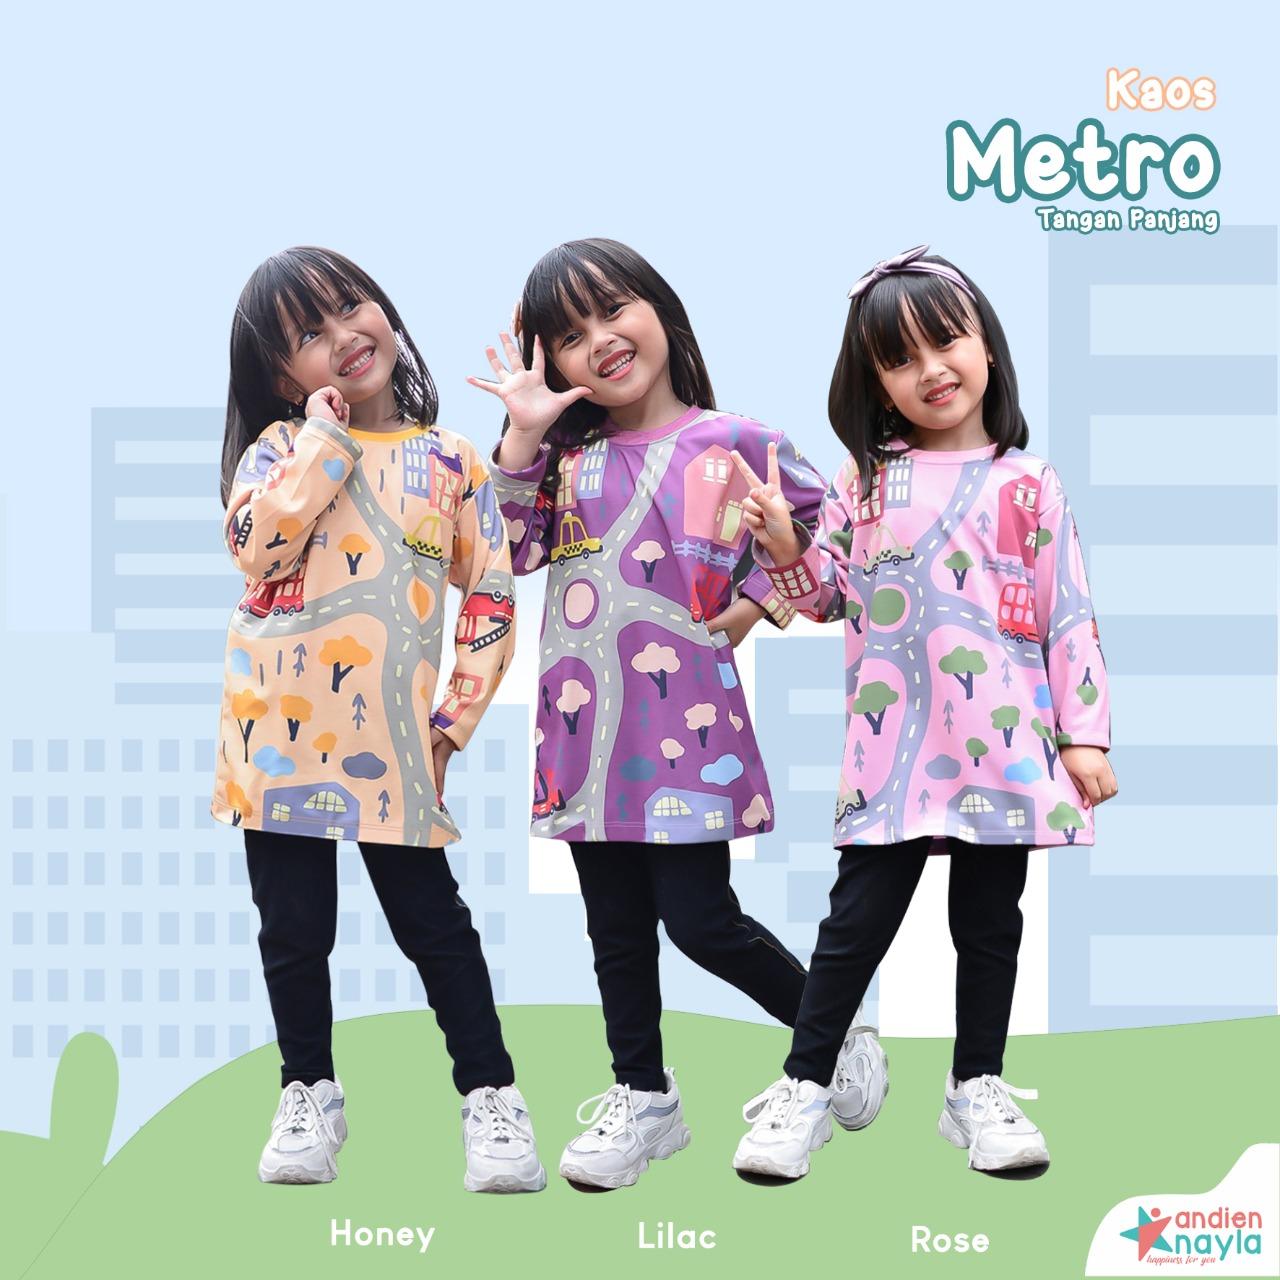 Kaos Metro Panjang